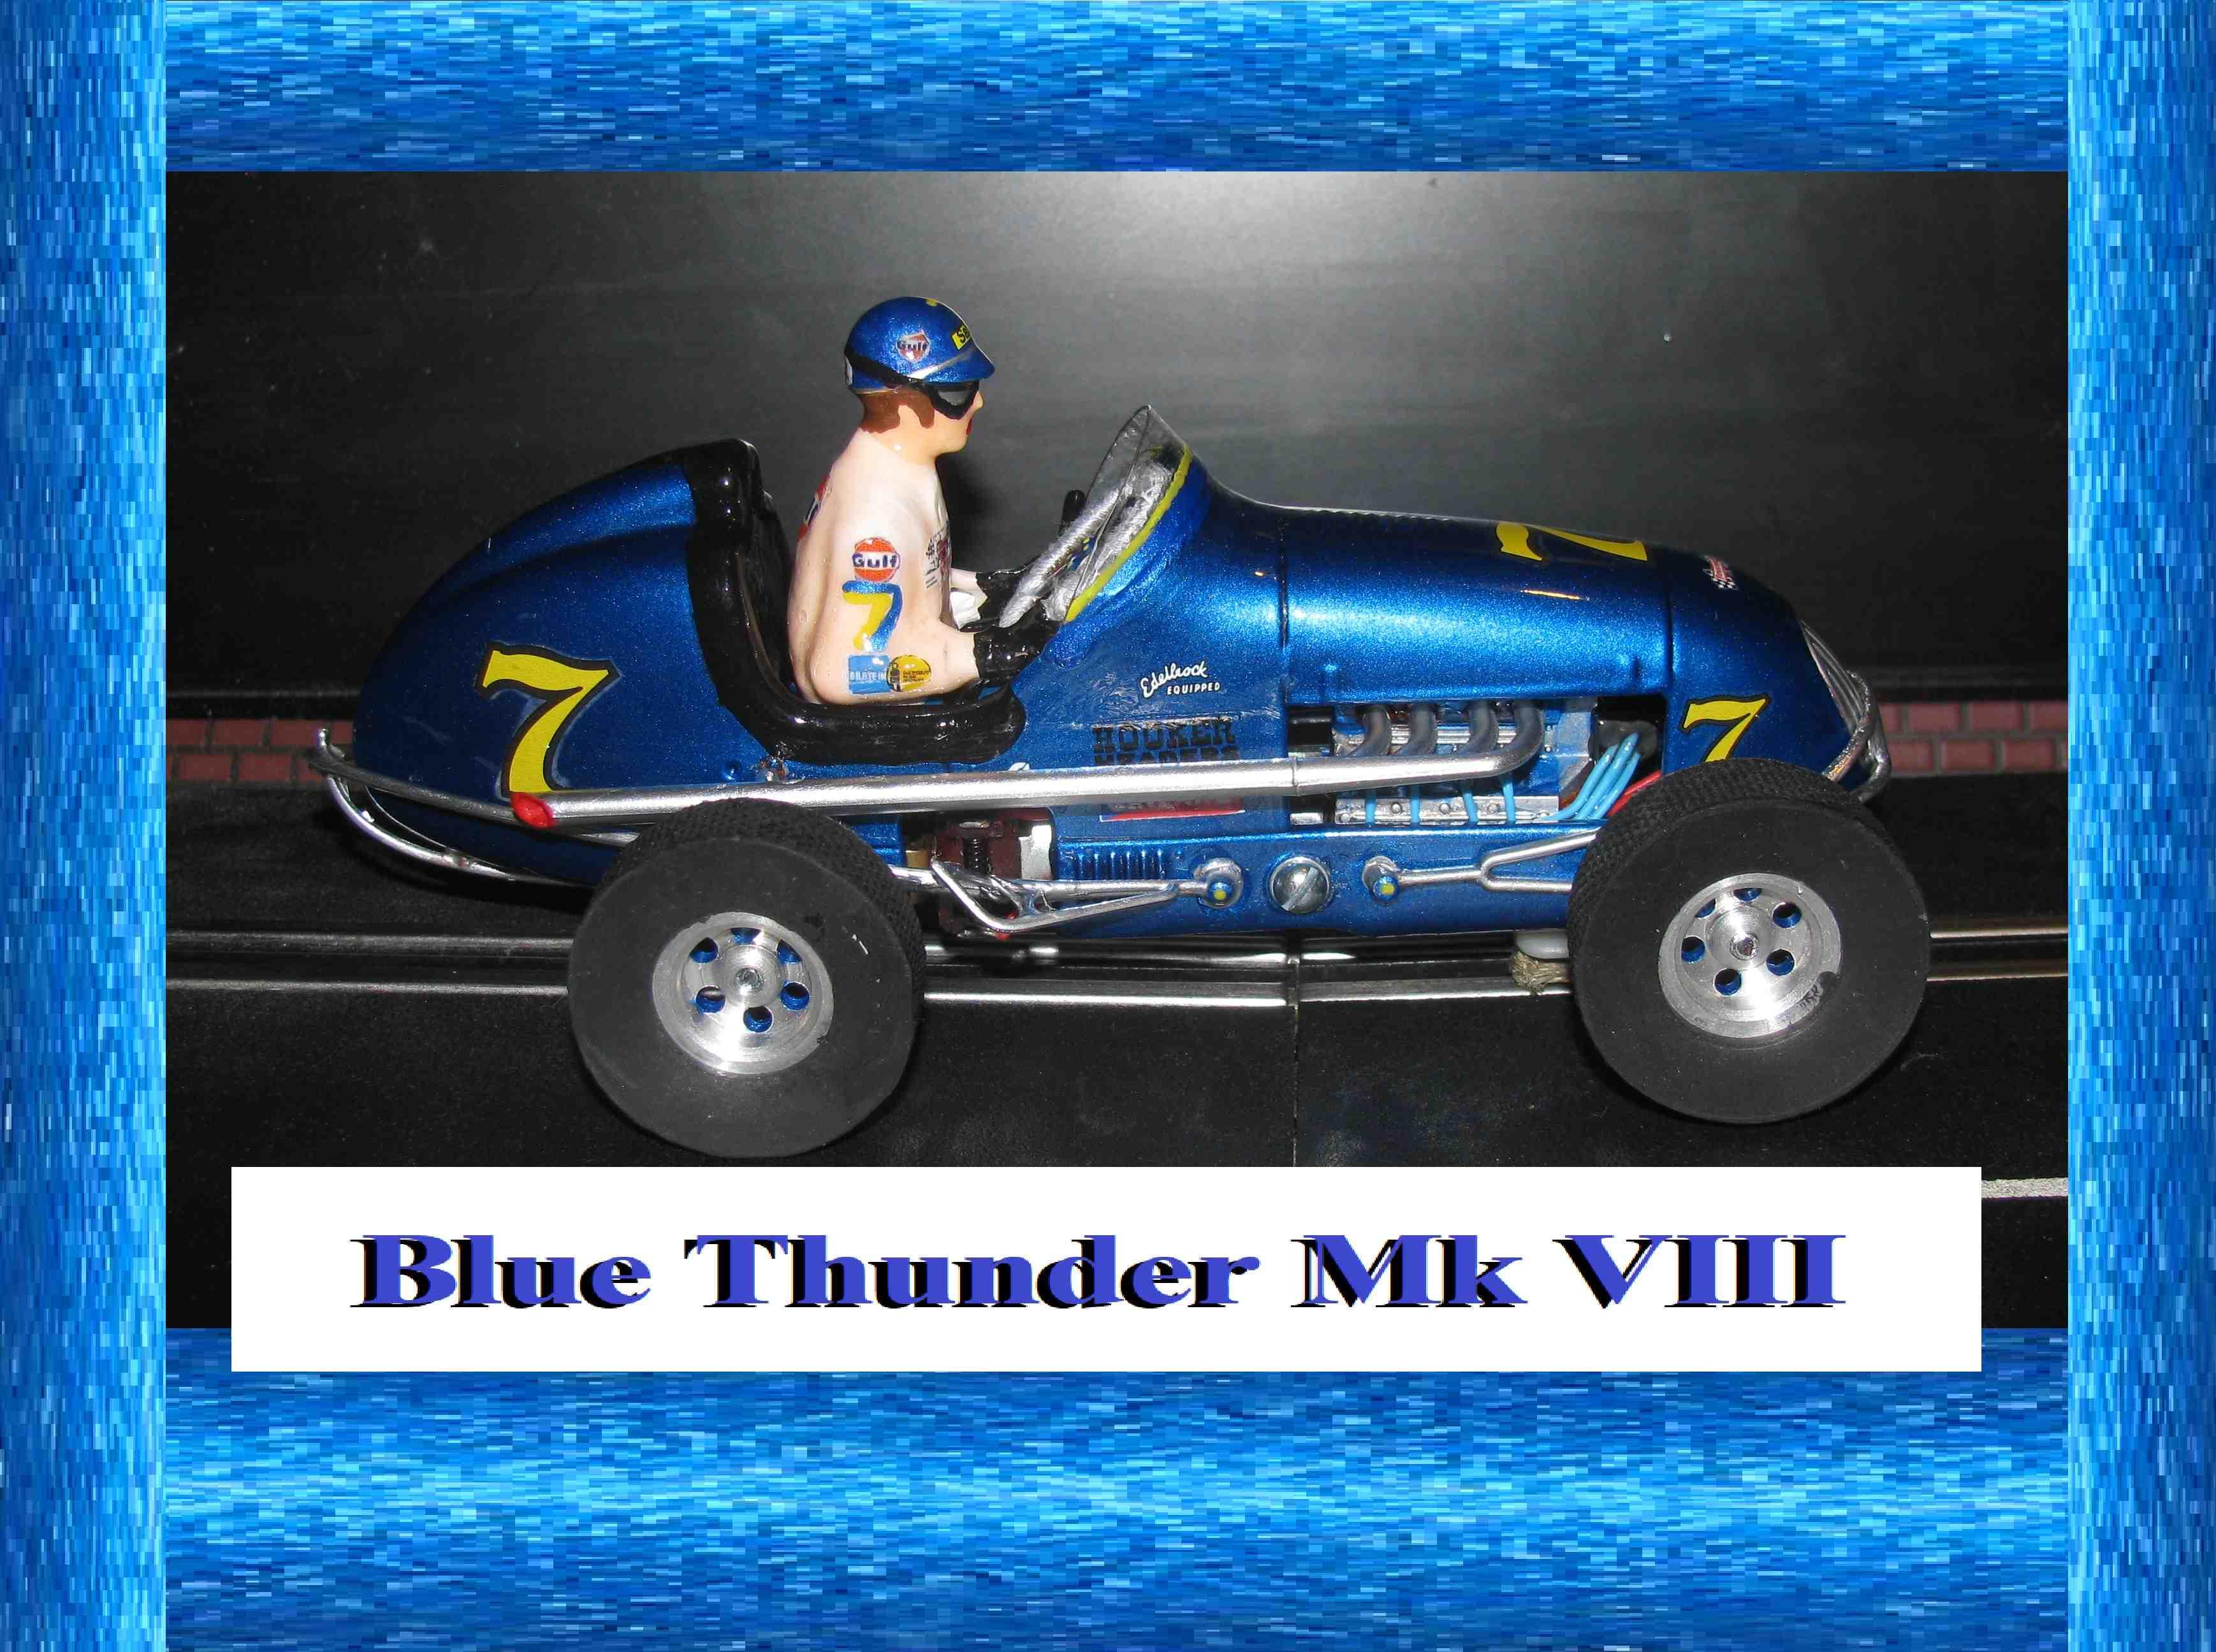 * SOLD * * SALE * Monogram Midget Racer Blue Thunder Mk VIII Racing Special Slot Car 1/24 Scale (Intense Blue Metallic)